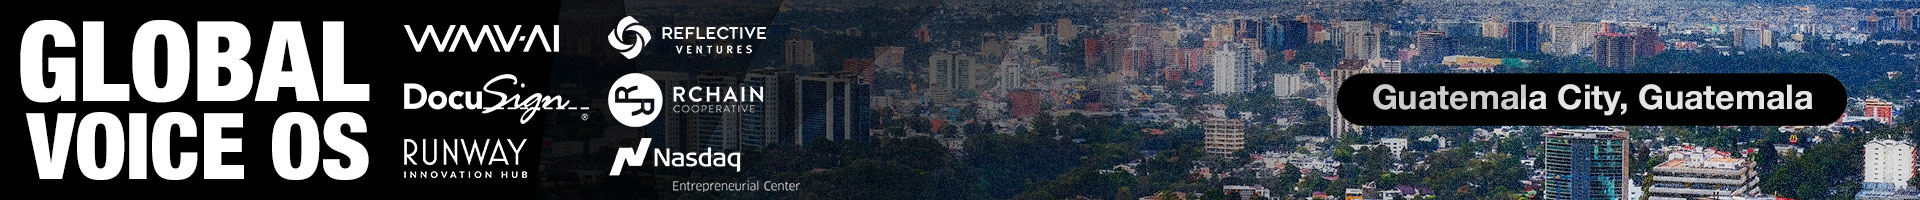 Event-Global-Voice-OS-1920x200-Guatemala-City-Guatemala